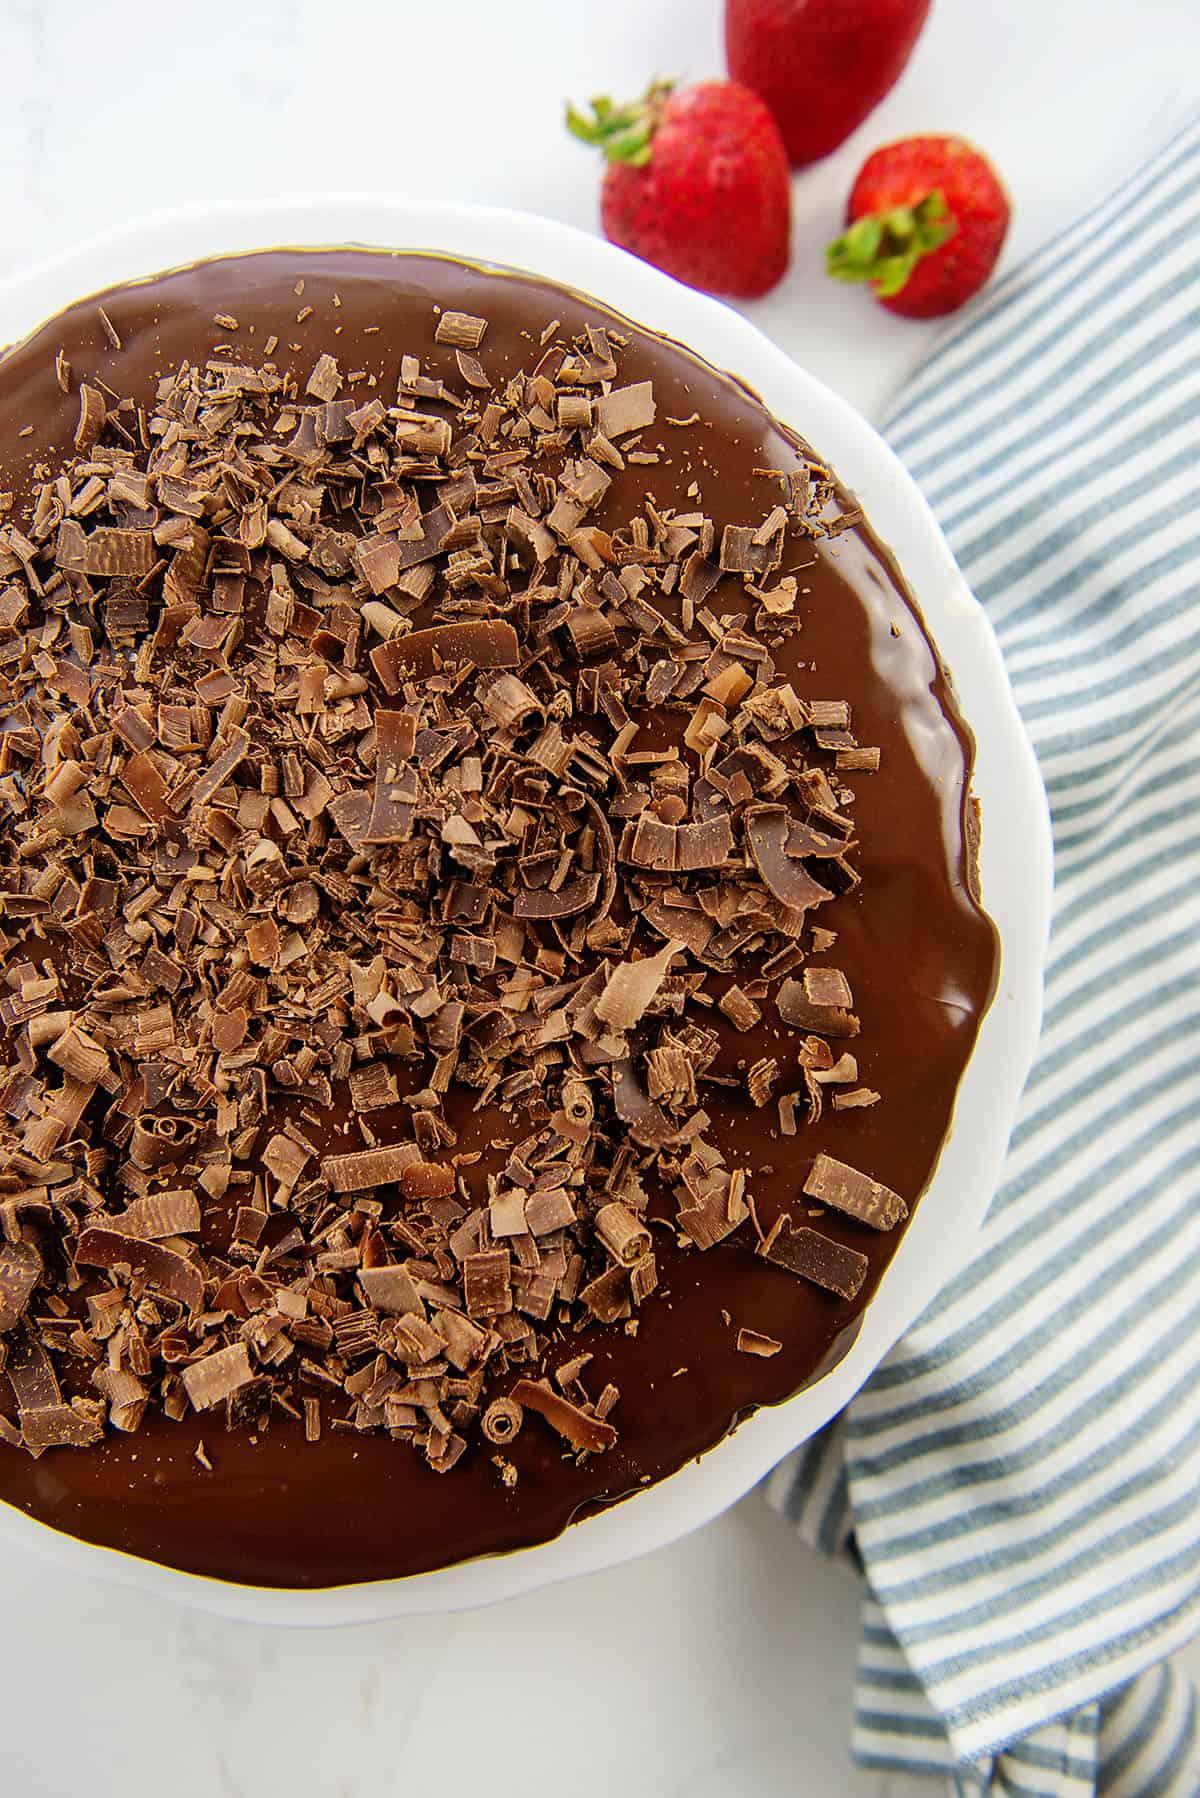 keto chocolate cheesecake on cake plate.